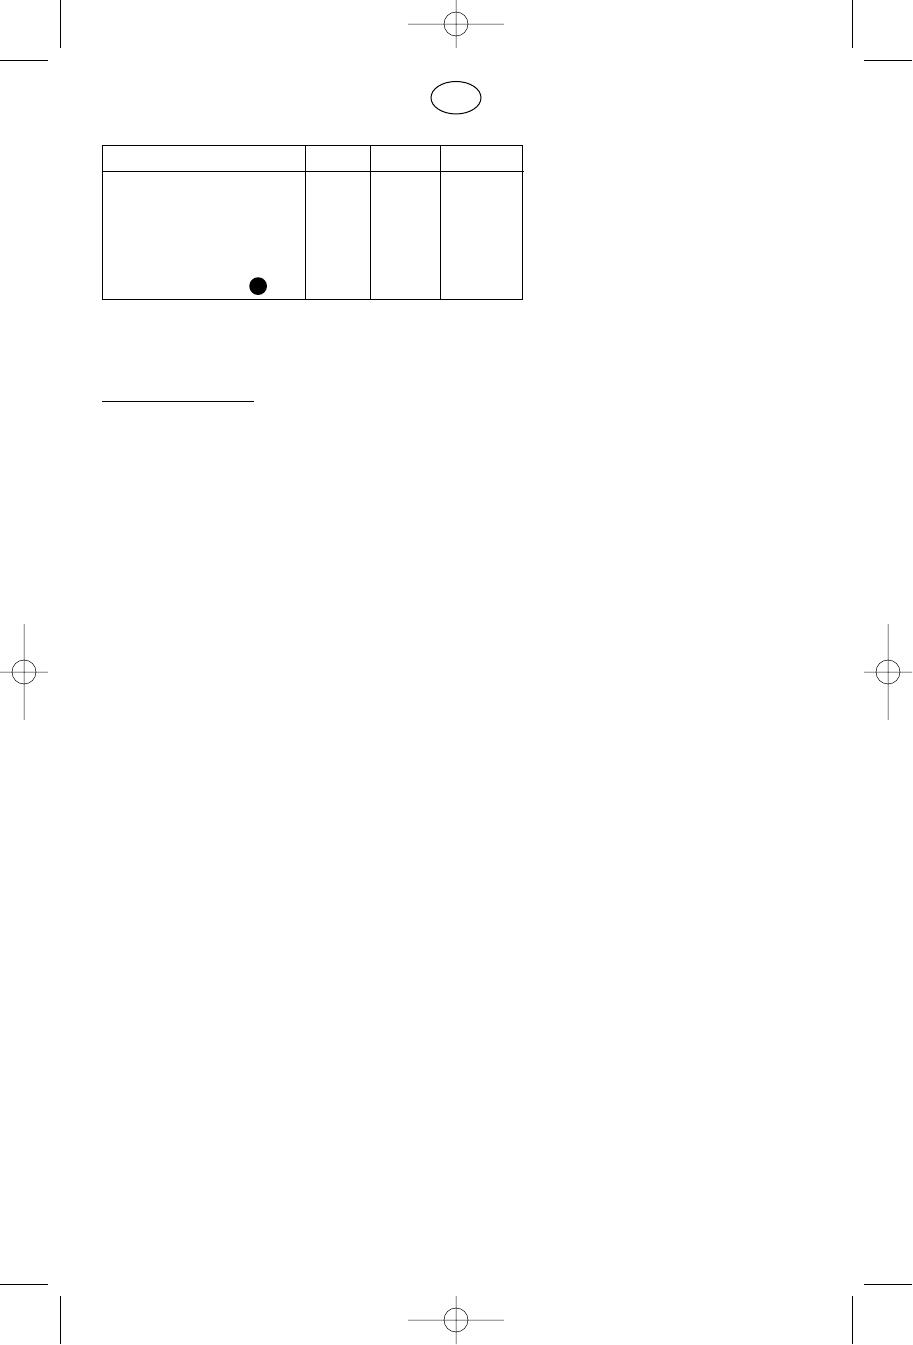 Dremel 395 Wiring Diagram Schematic Diagrams Handleiding Pagina 21 Van 73 Dansk Deutsch English Multi Tool